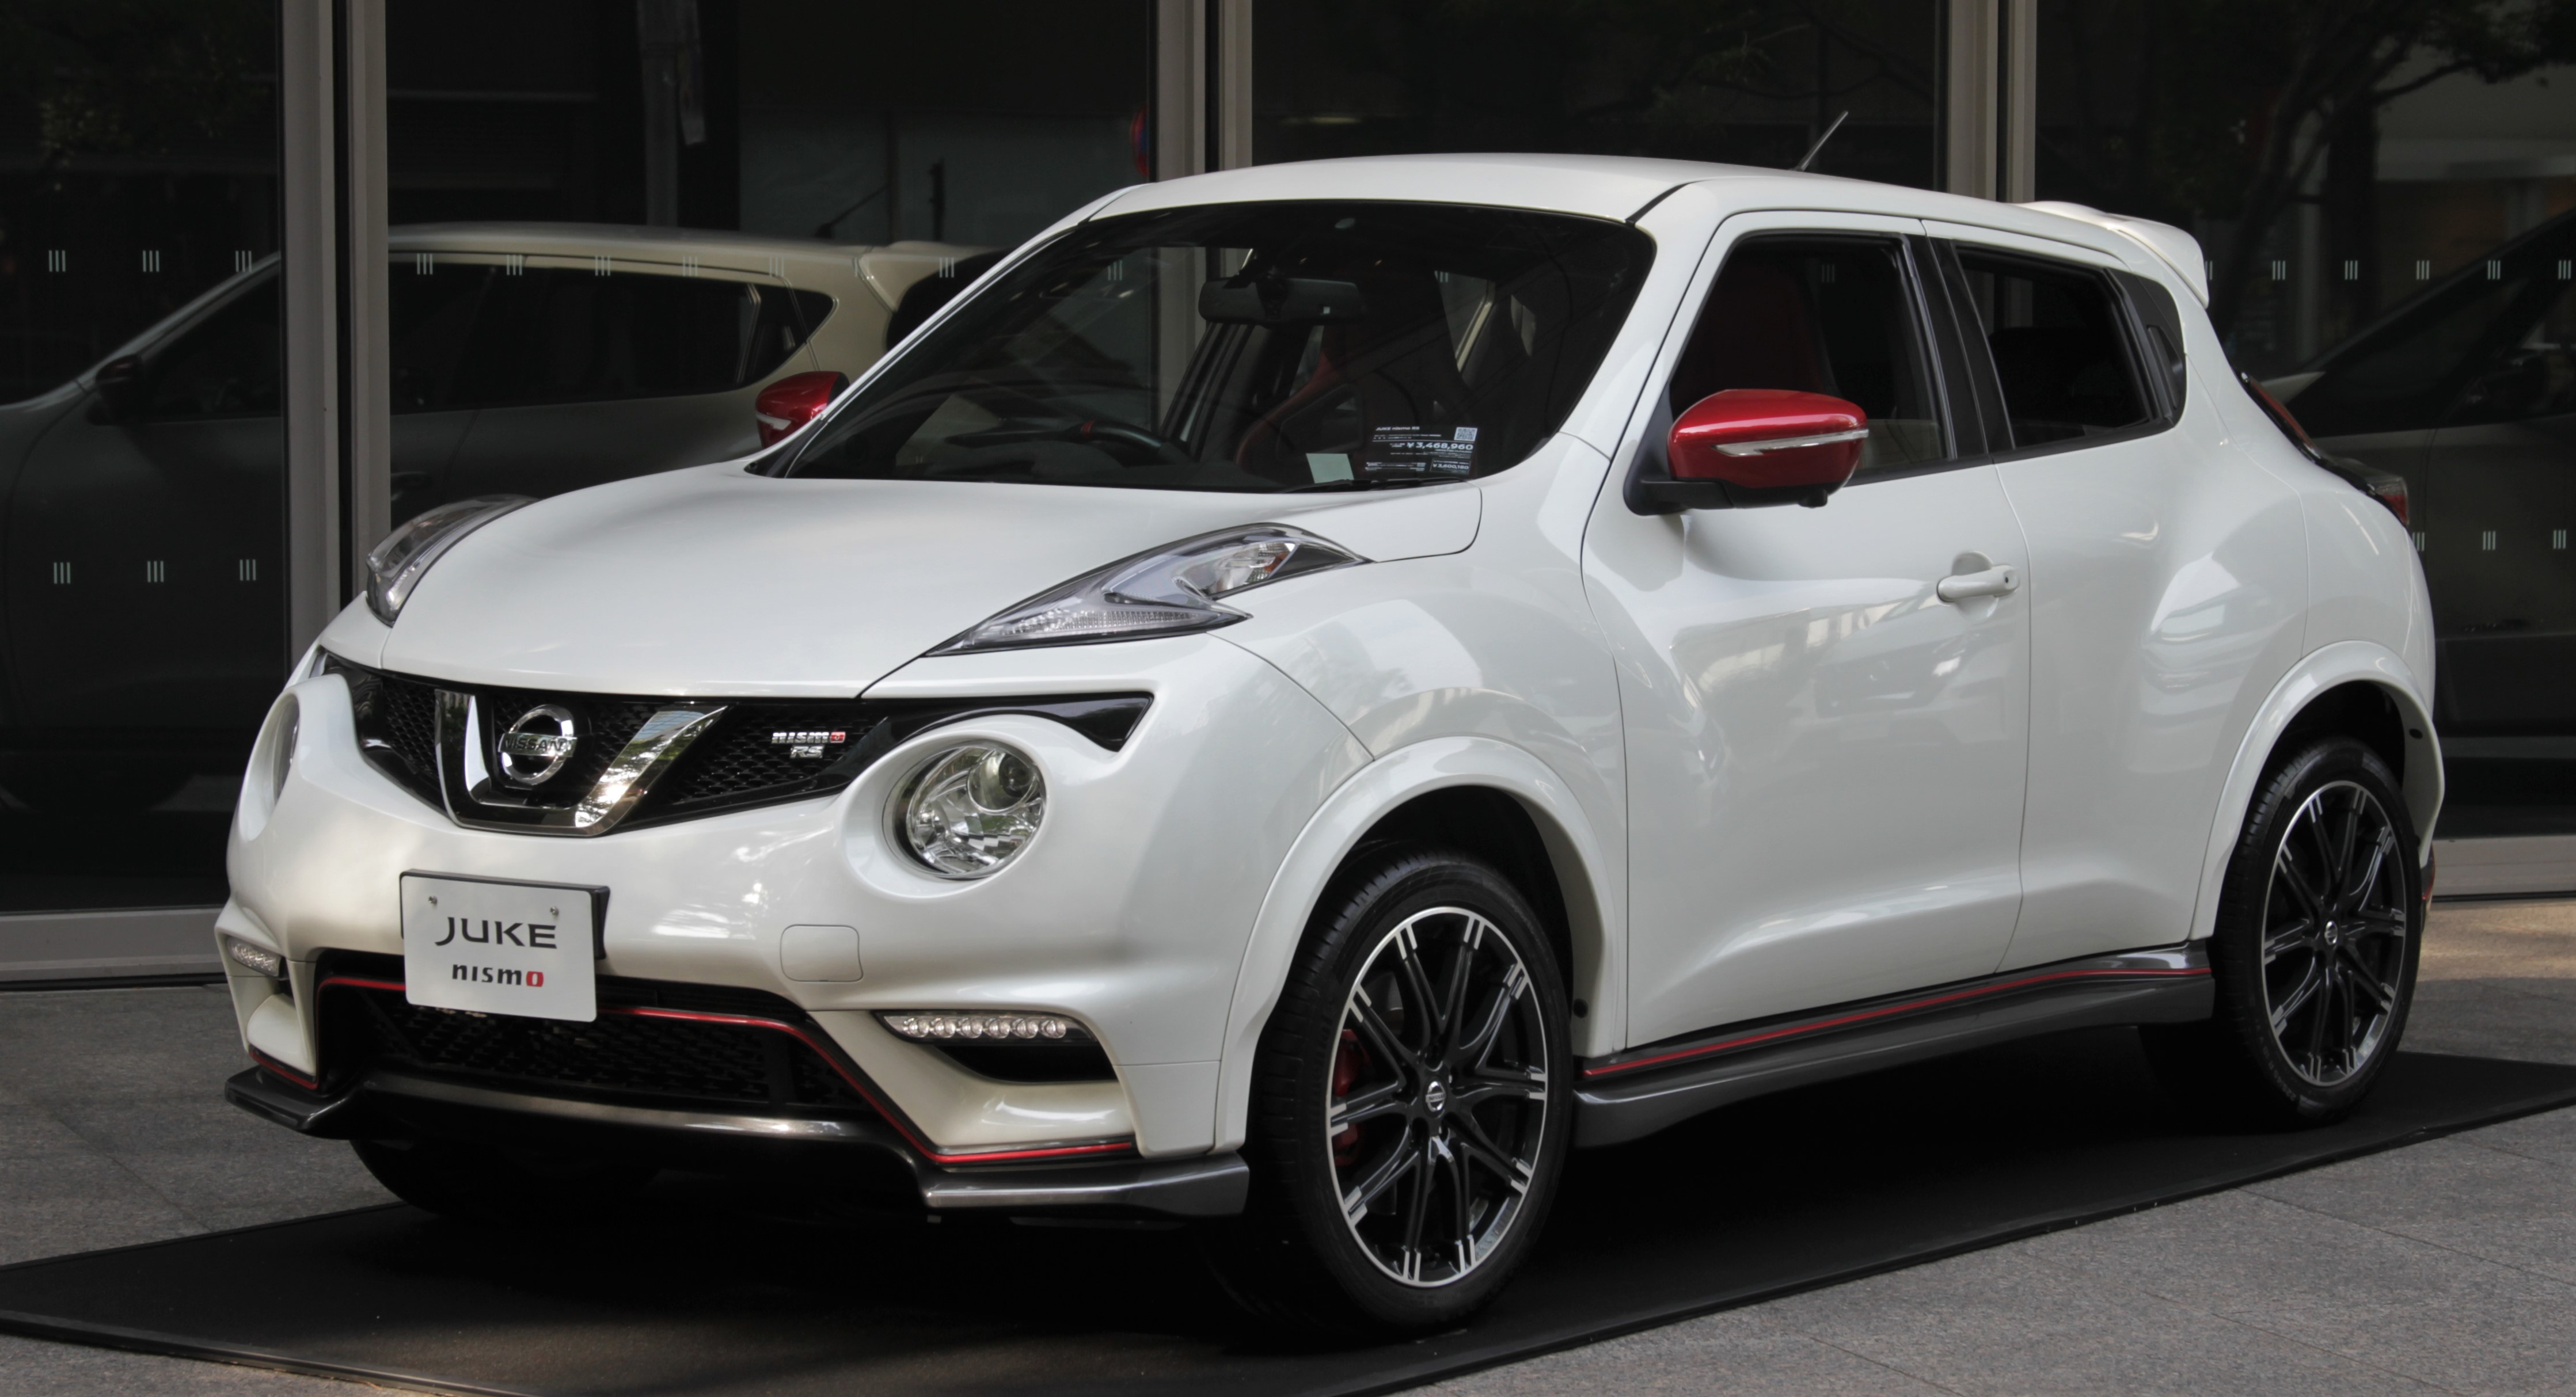 Nissan Juke Nismo Rs >> File 2018 Nissan Juke Nismo Rs Jpg Wikimedia Commons